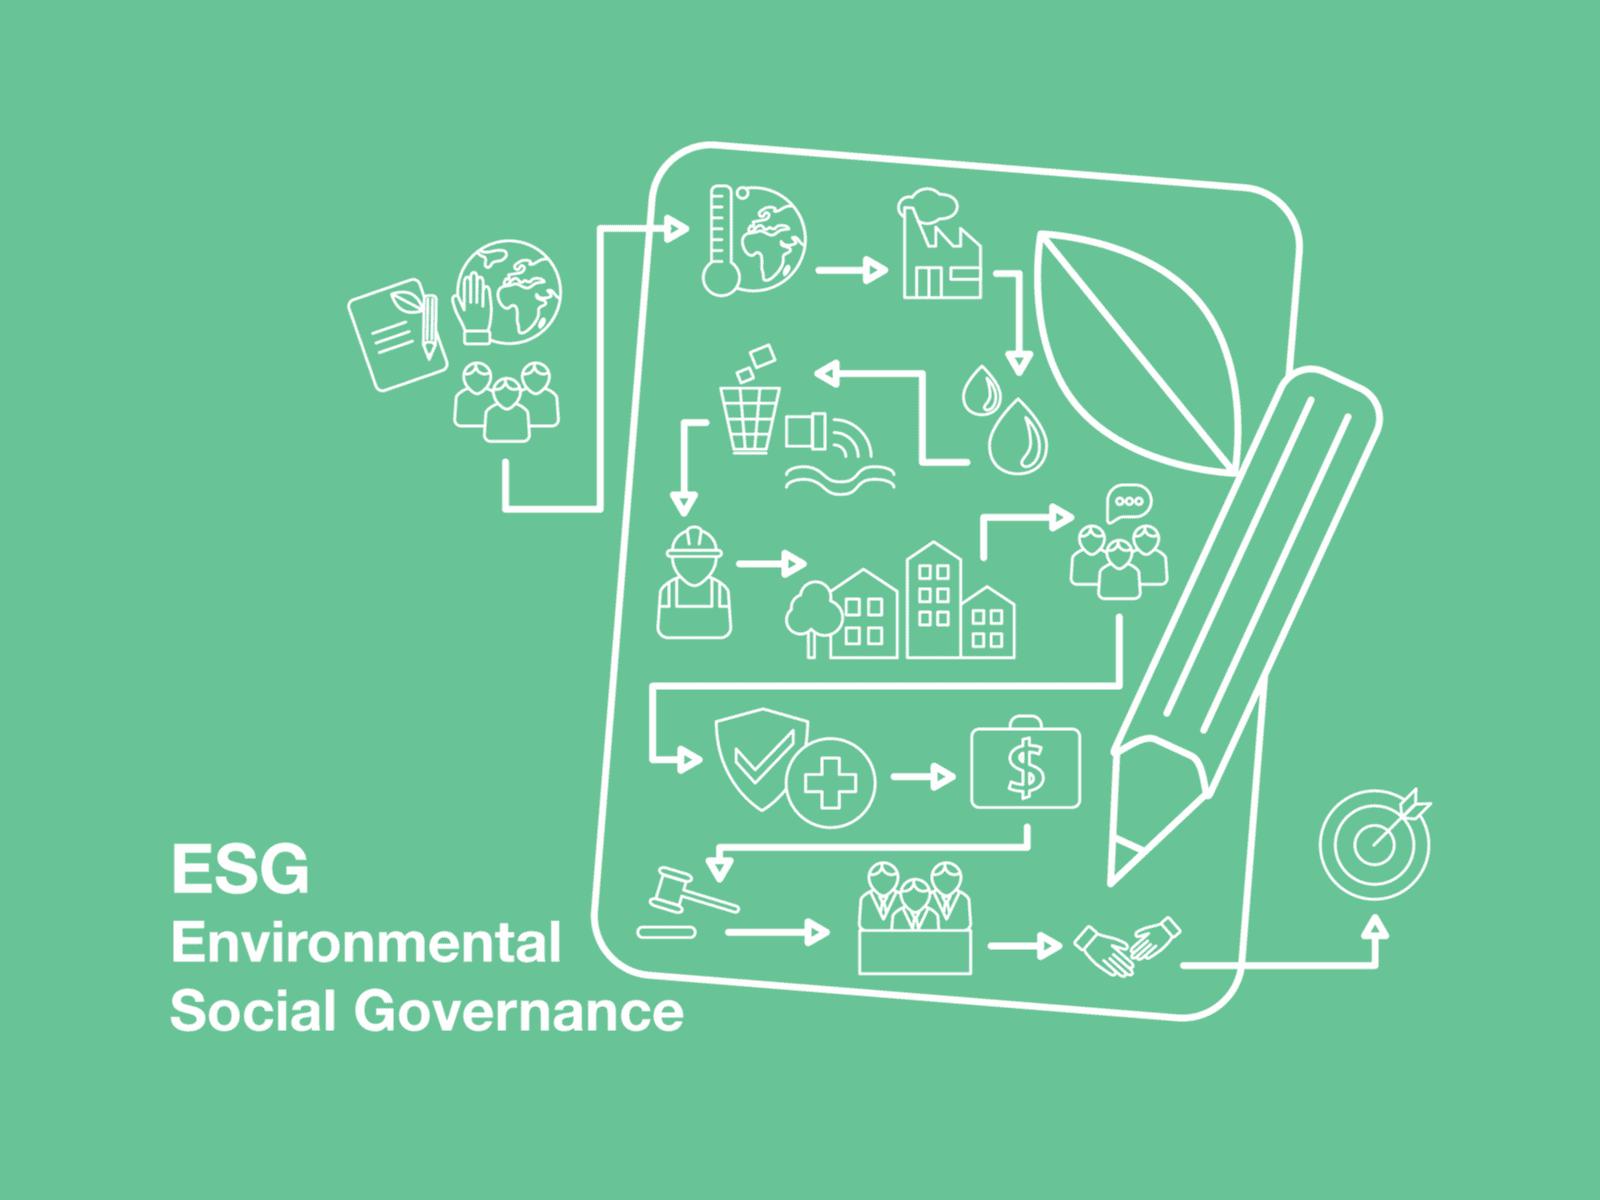 ESG - Environmental Social Governance